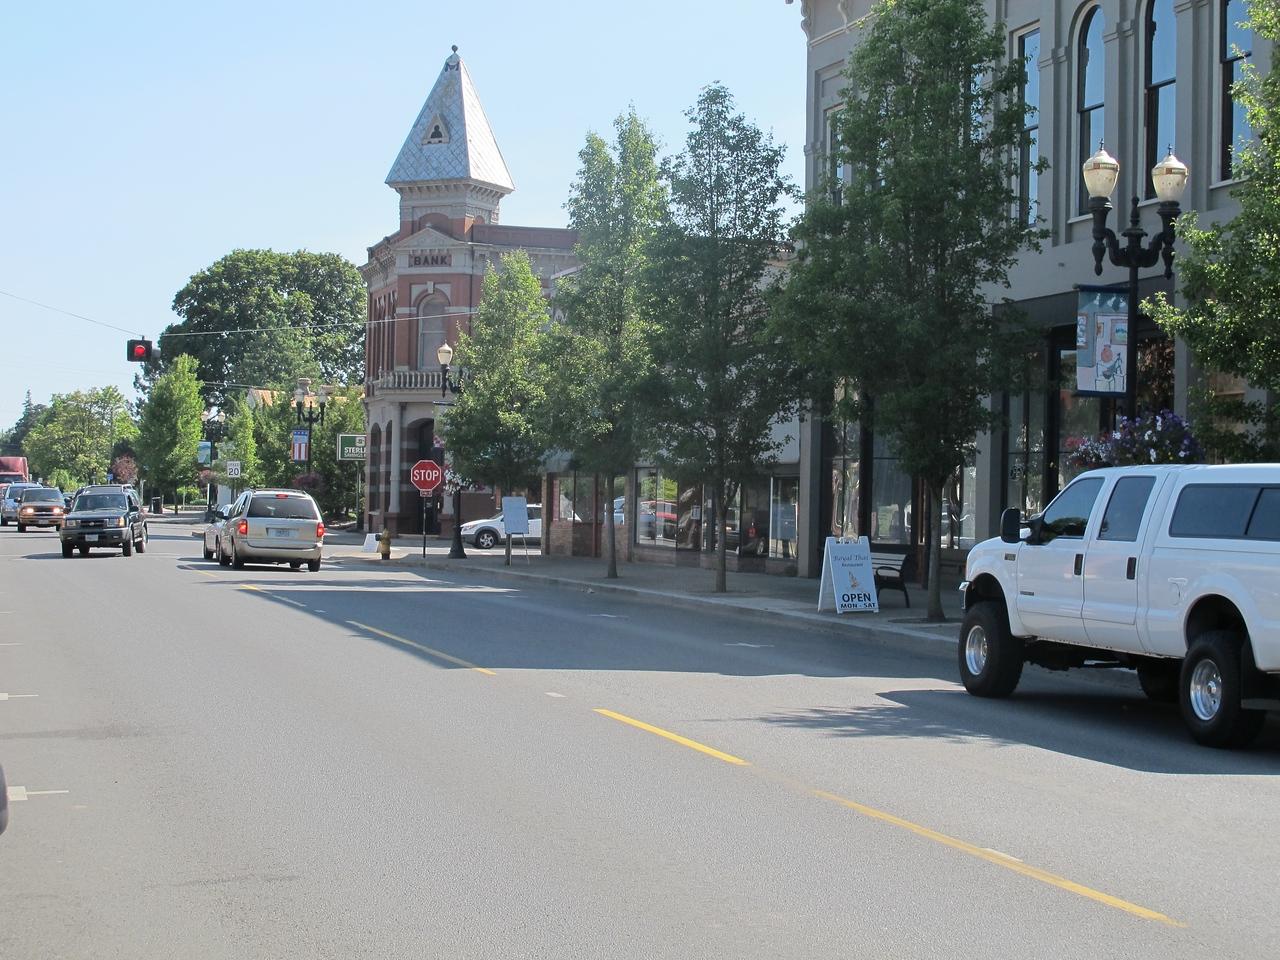 Independence main street.